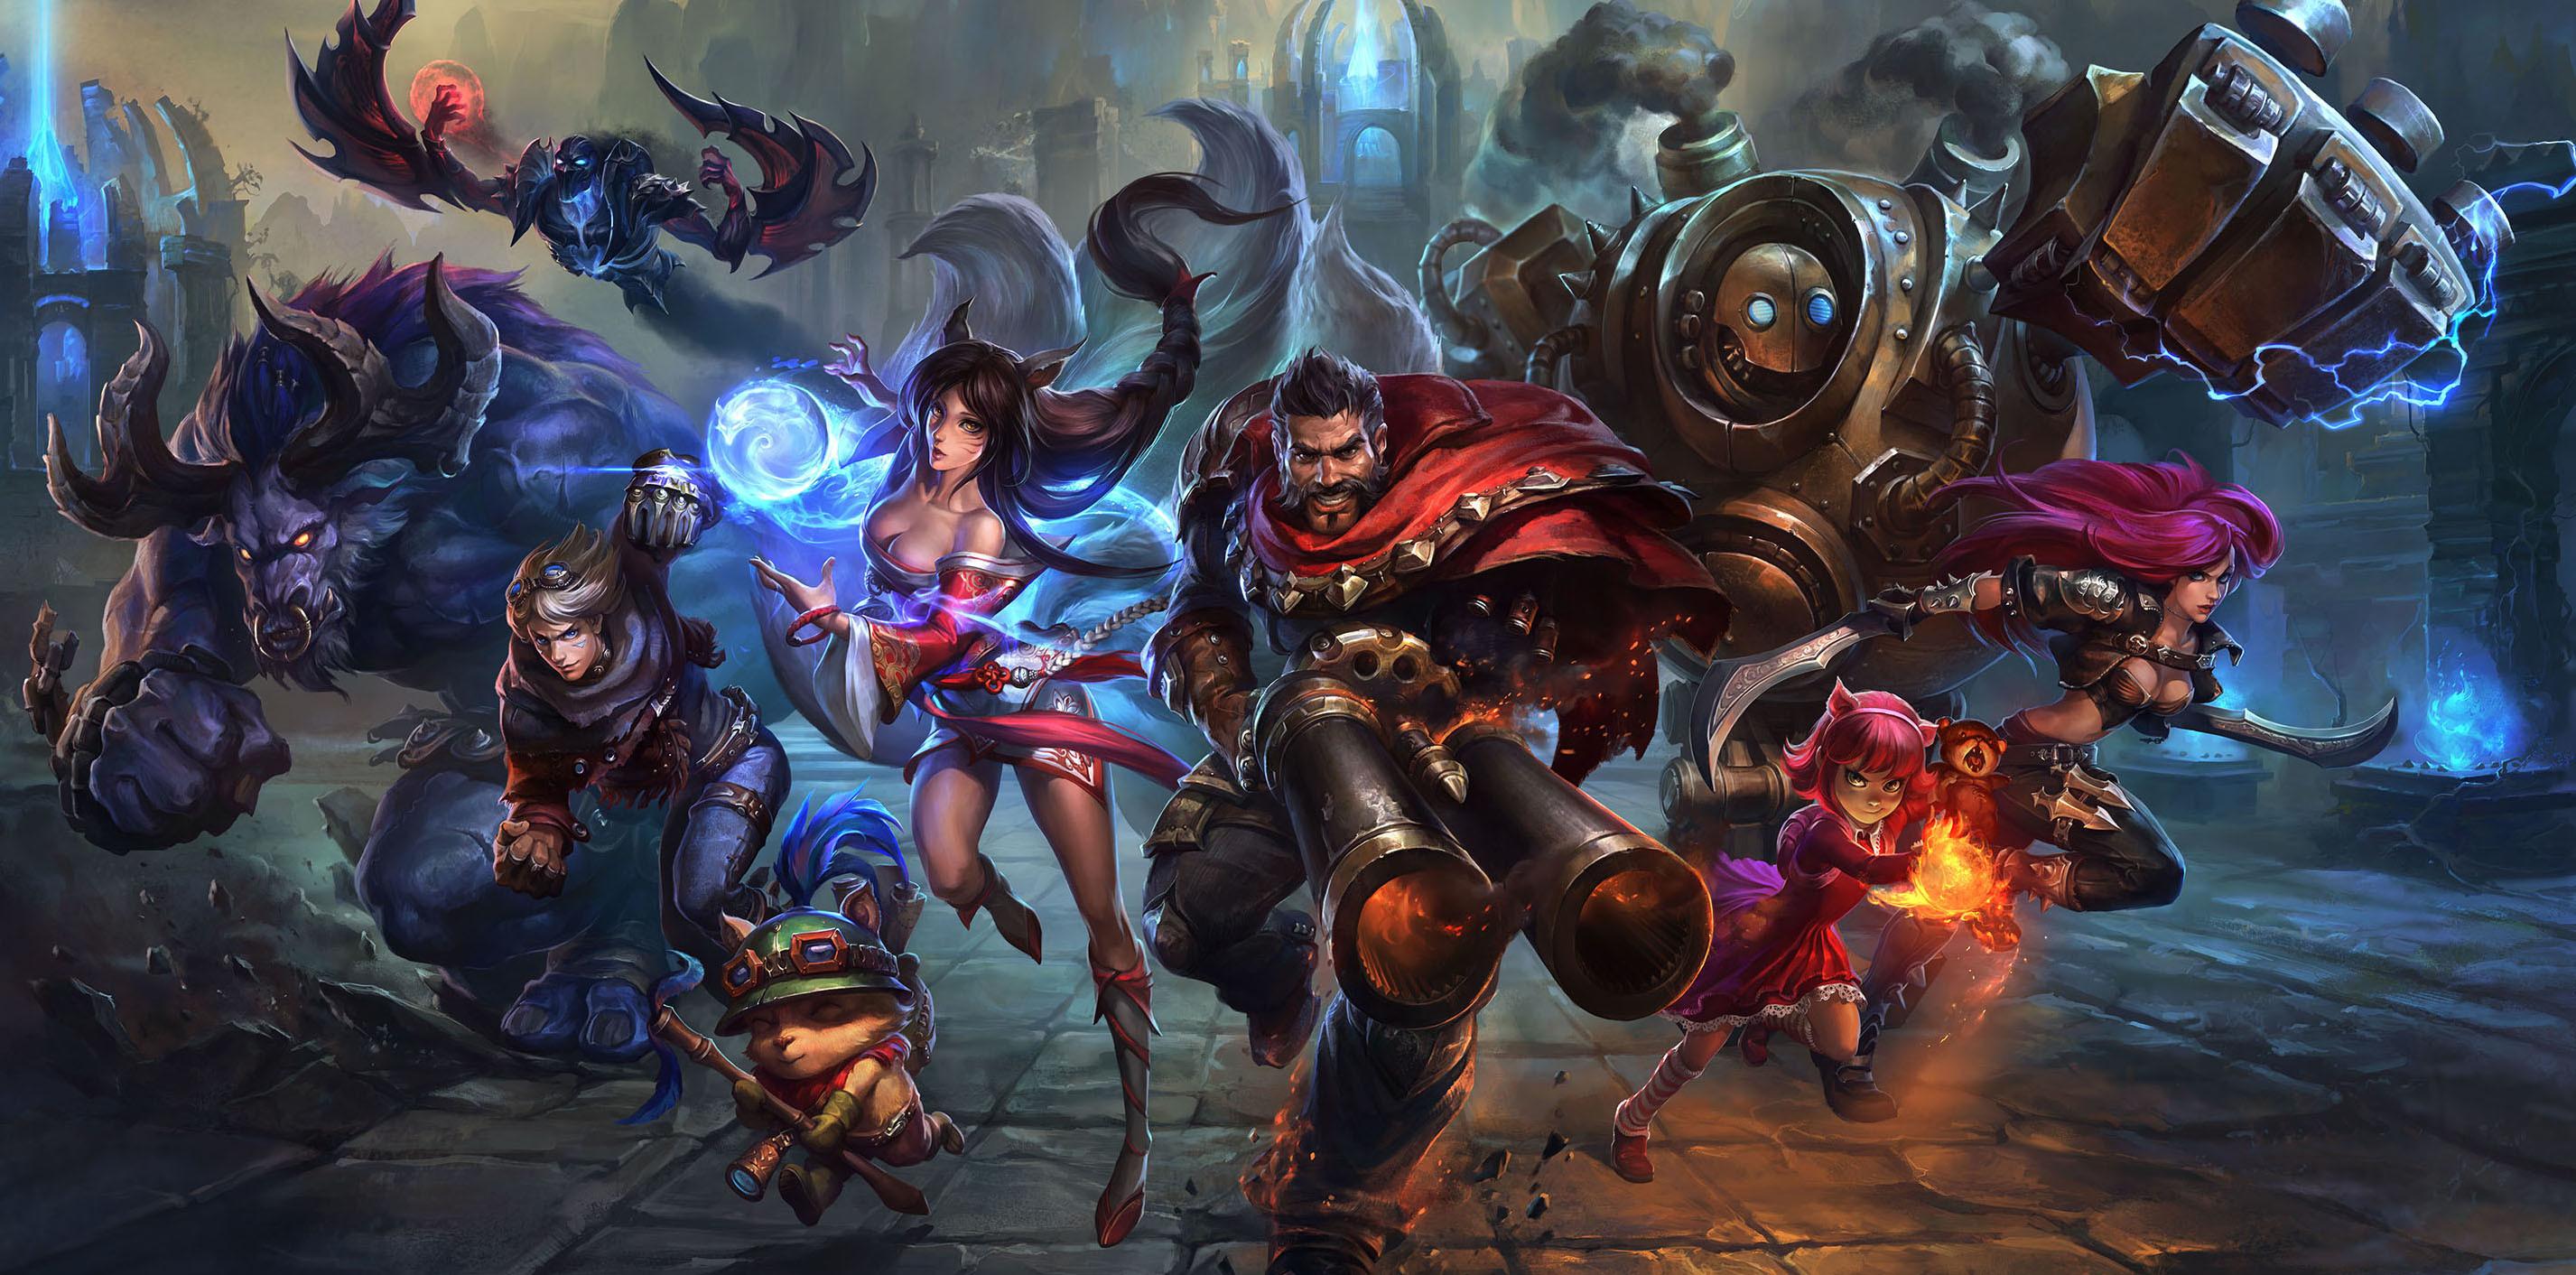 Res: 2853x1412, League of Legends Champions wallpaper